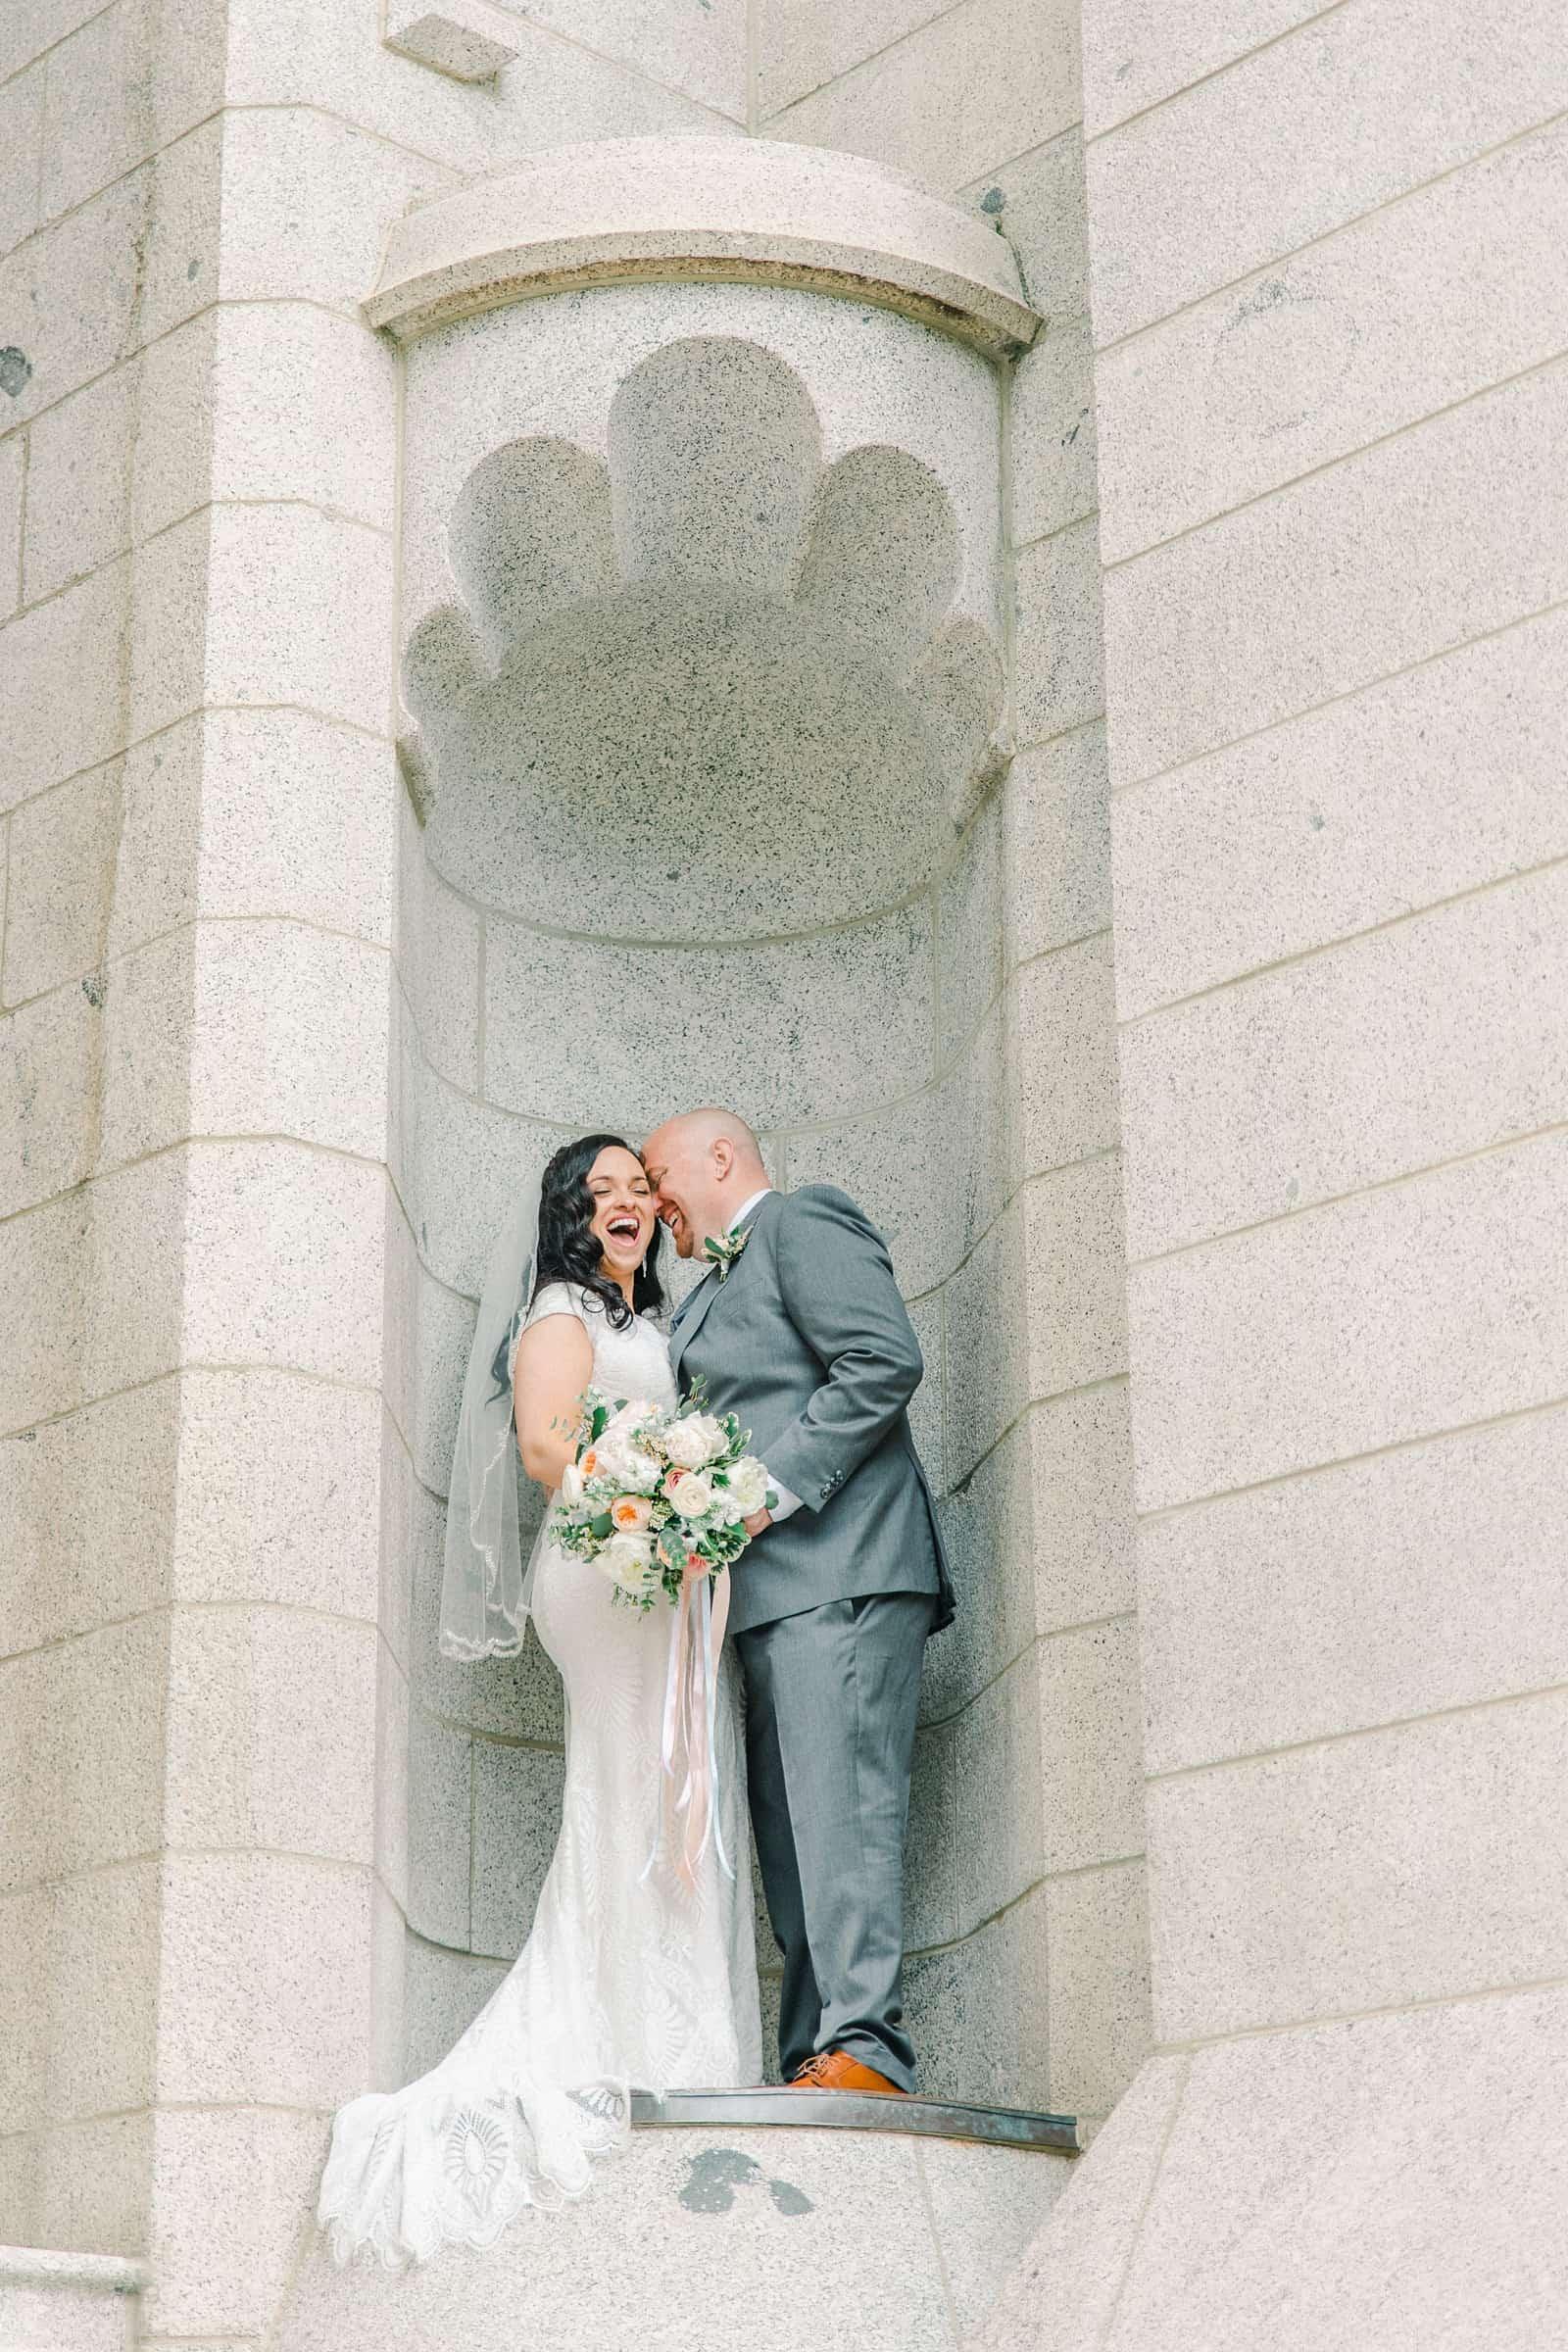 Thomas S. Monson Center Wedding, Salt Lake LDS Temple Wedding, Utah wedding photography. bride and groom